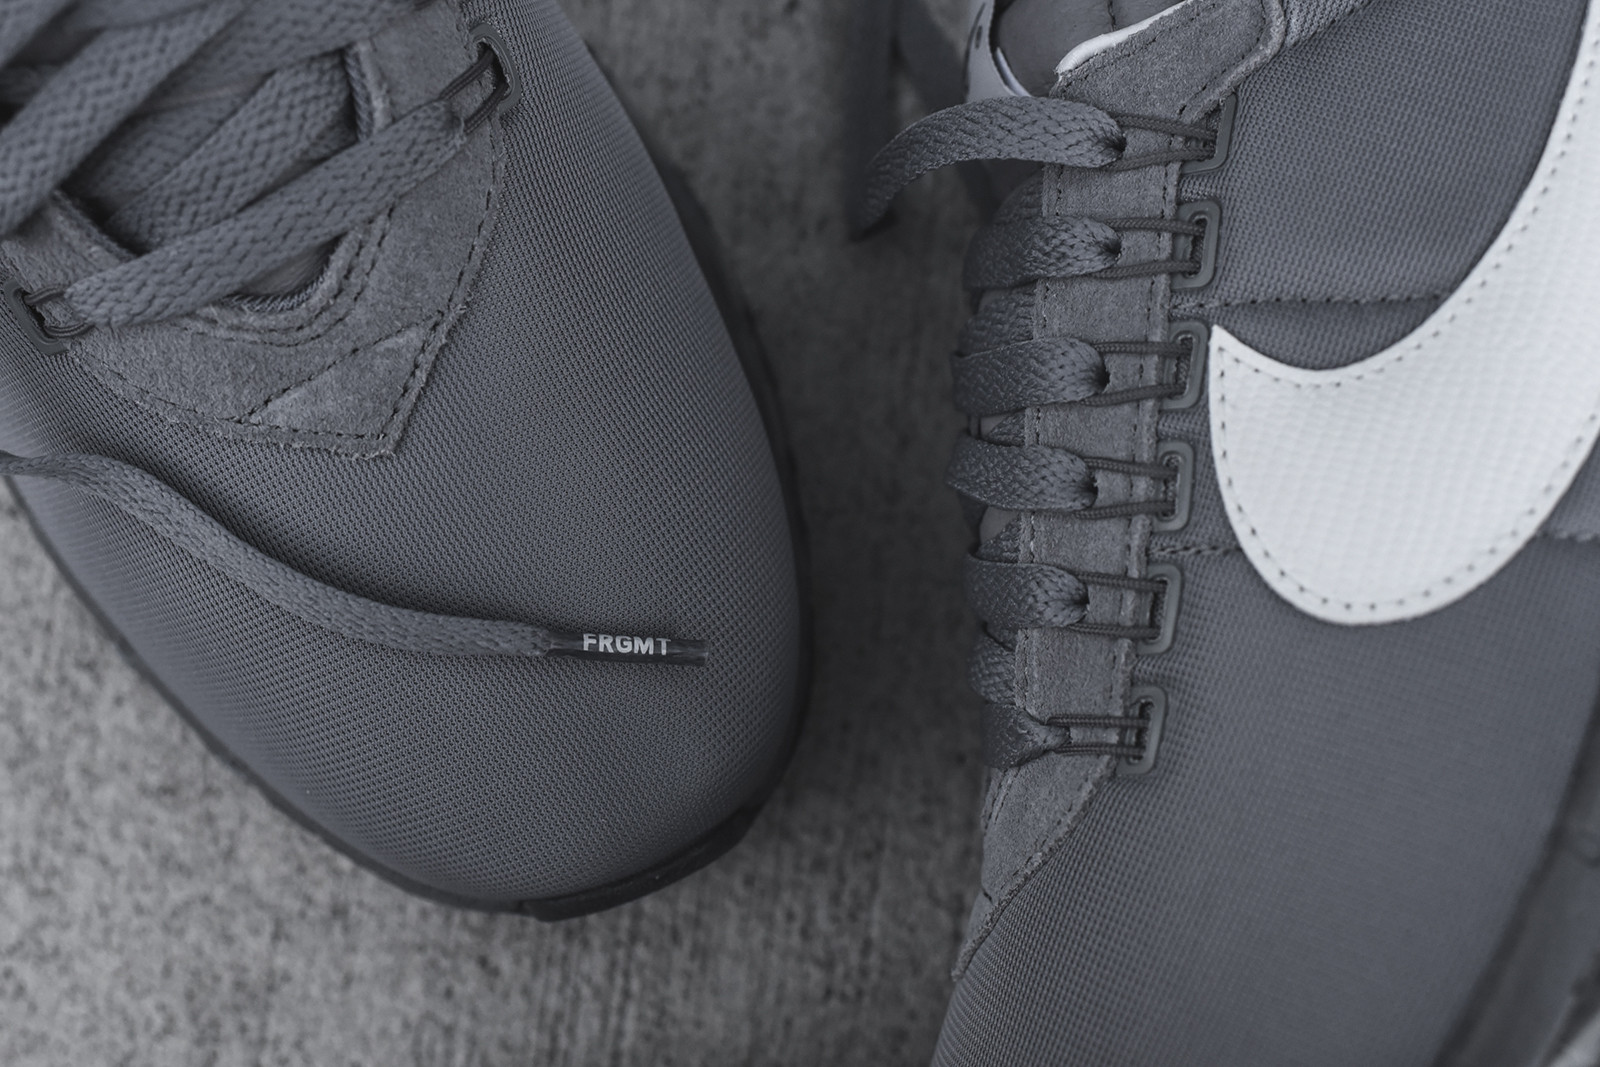 Fragment Nike Air Max LD Zero 885893-002 Toe Detail